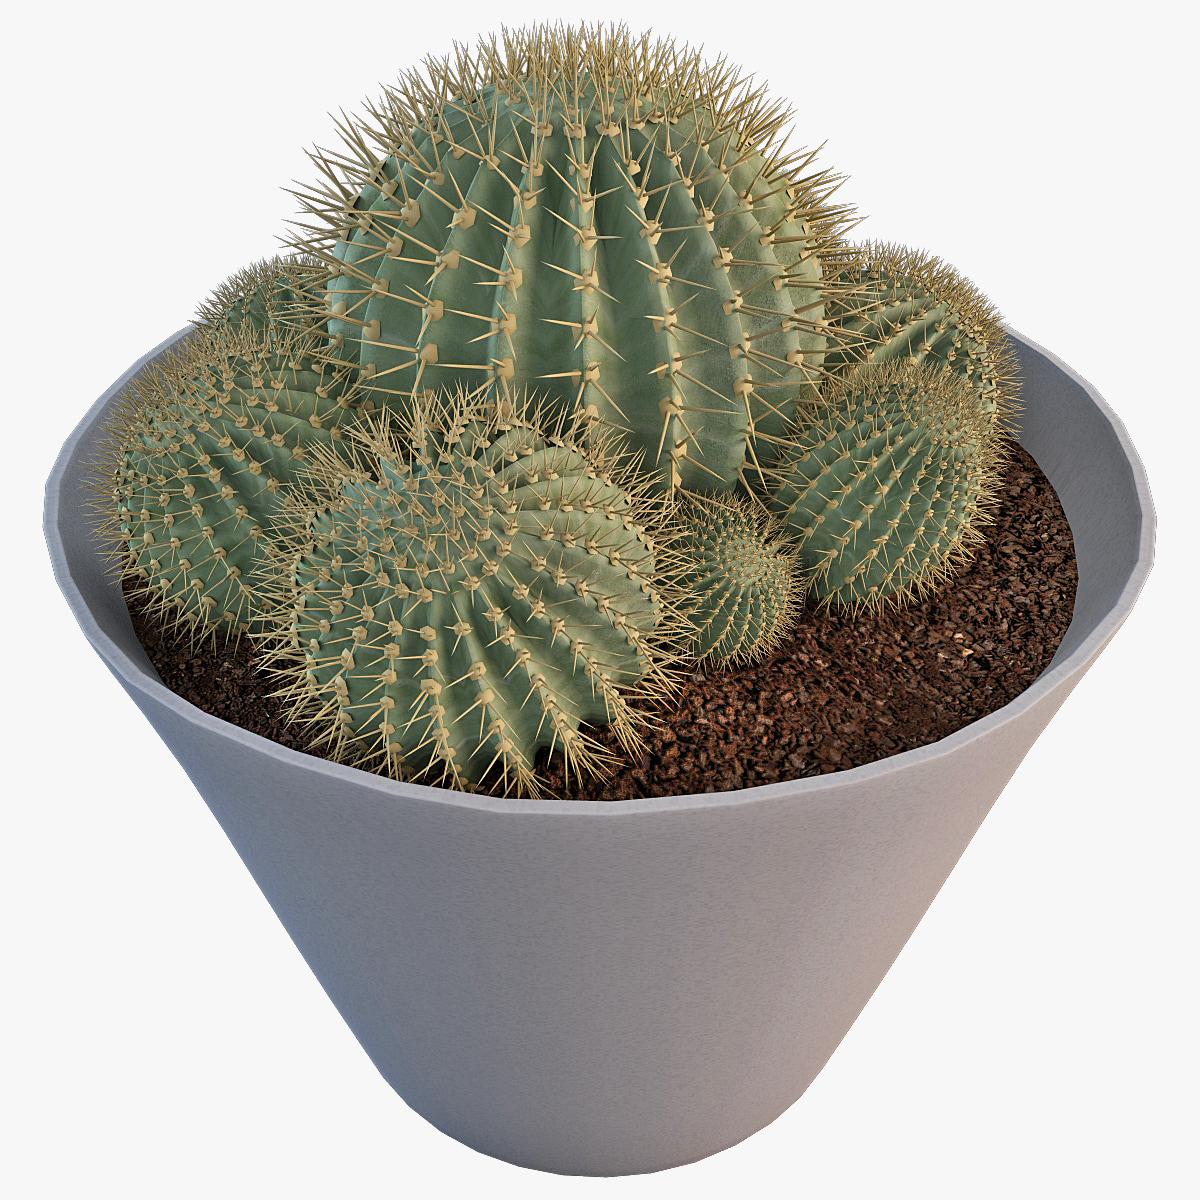 101980_Cactus_Epiphyllum_Sp_v2_000.jpg